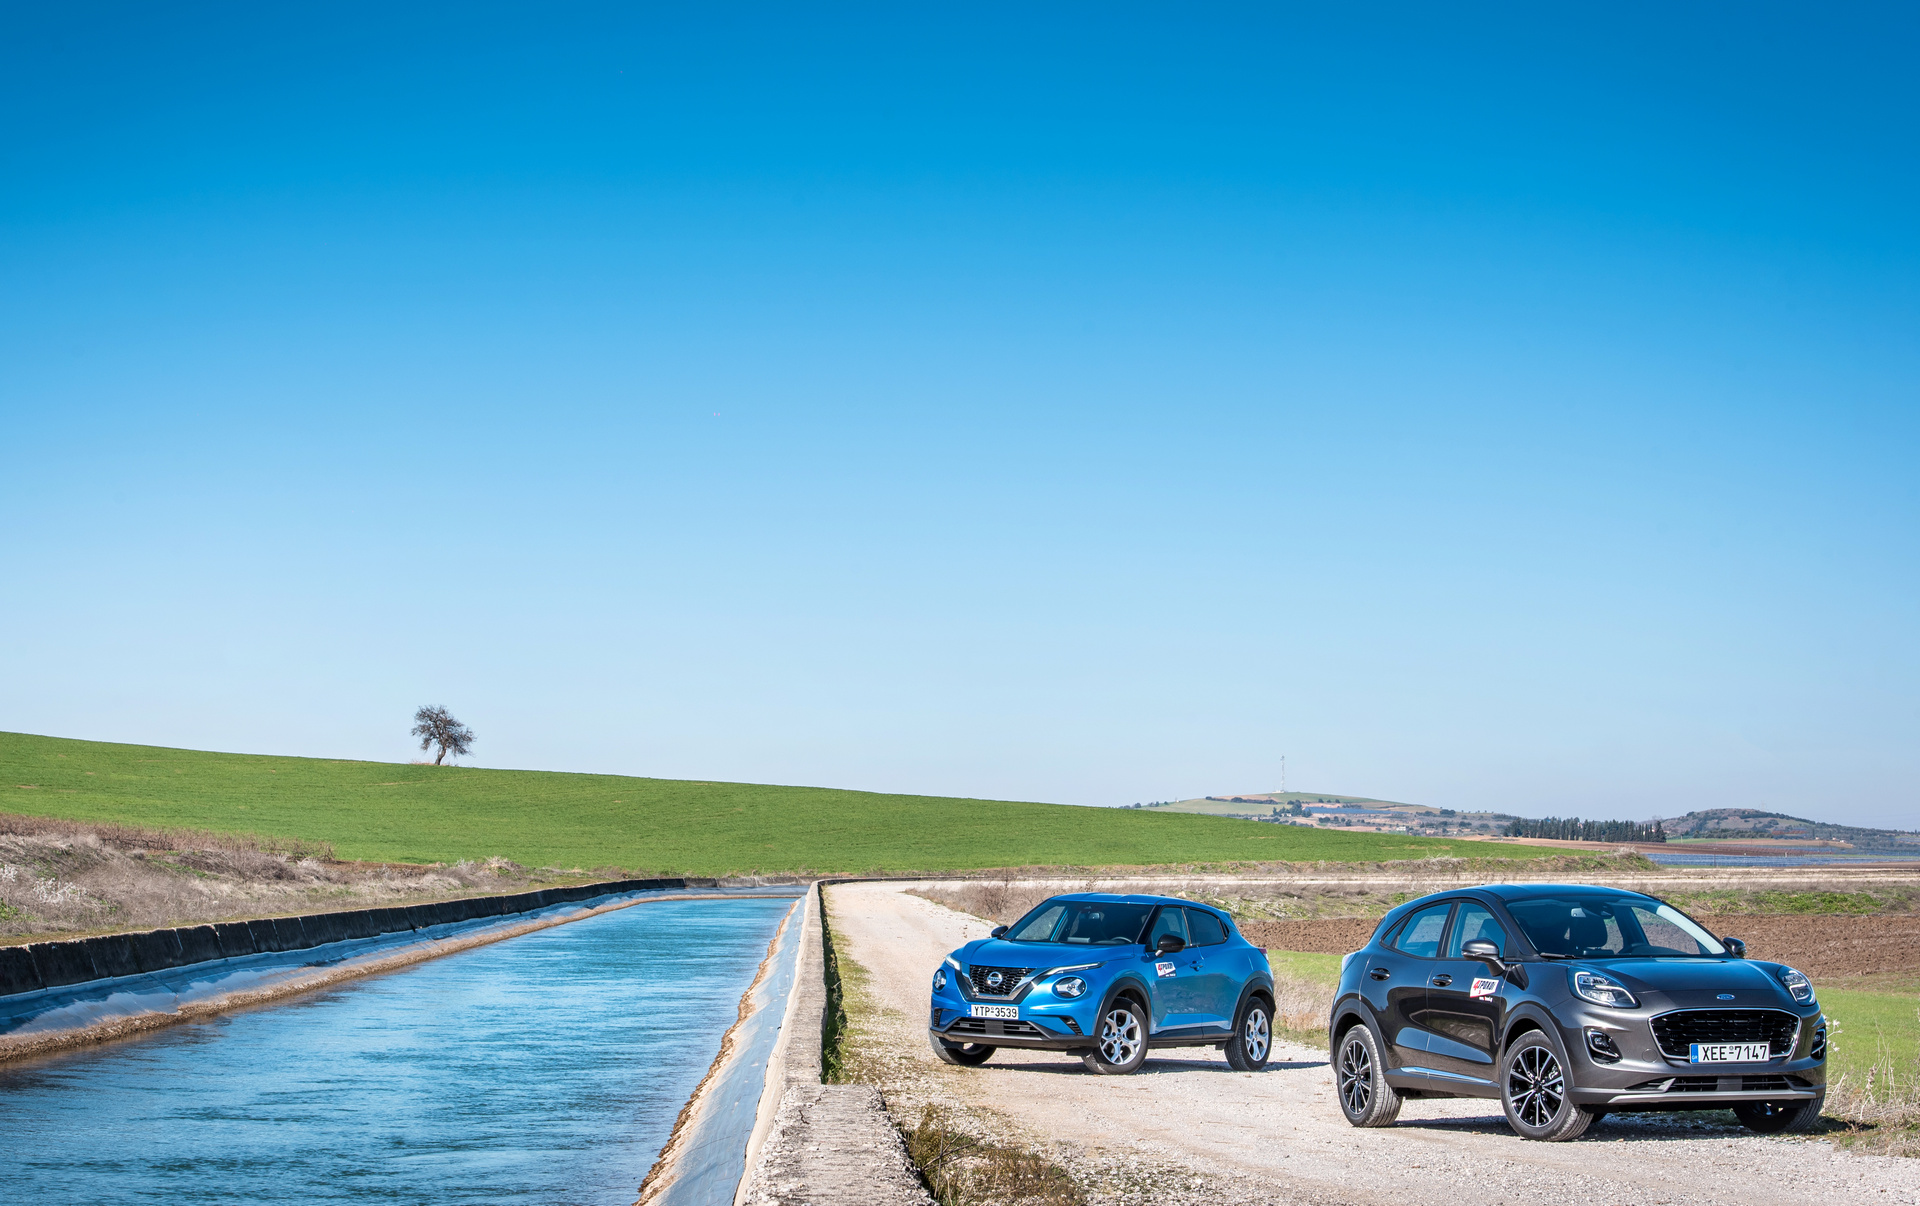 Ford Puma 1.0 EcoBoost Hybrid 125 PS – Nissan Juke 1.0 DIG-T 117 PS